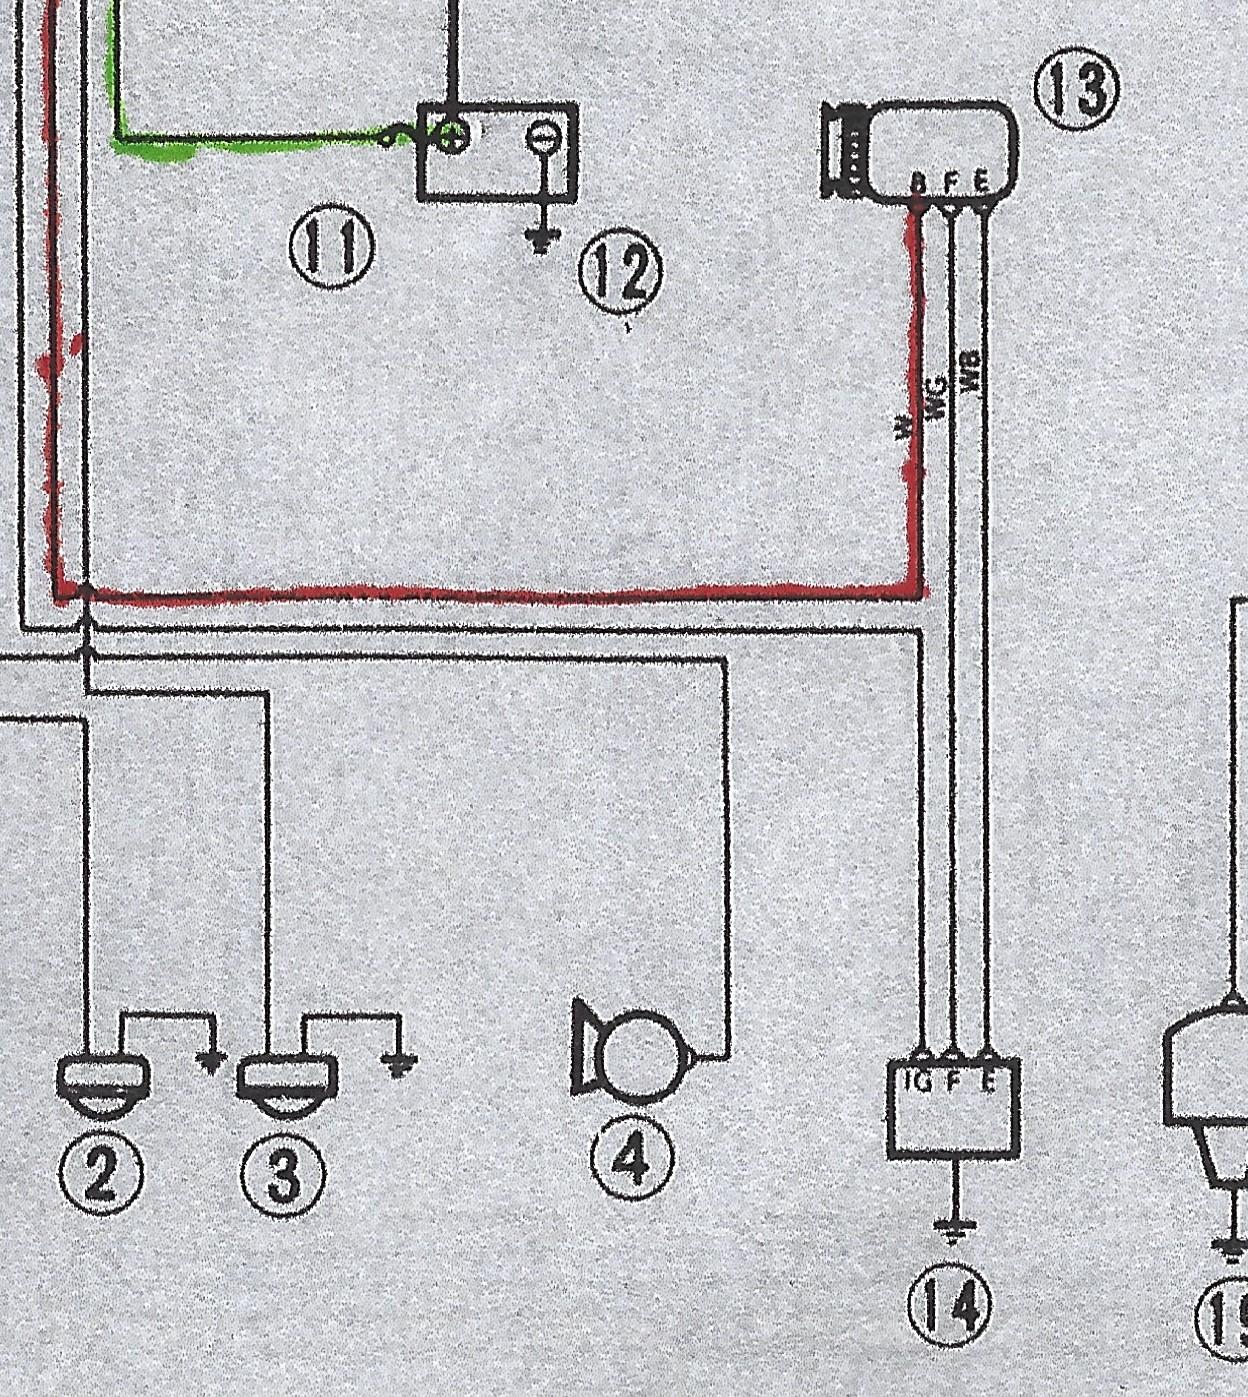 Externally Regulated New Alternator  Regulator  Ammeter